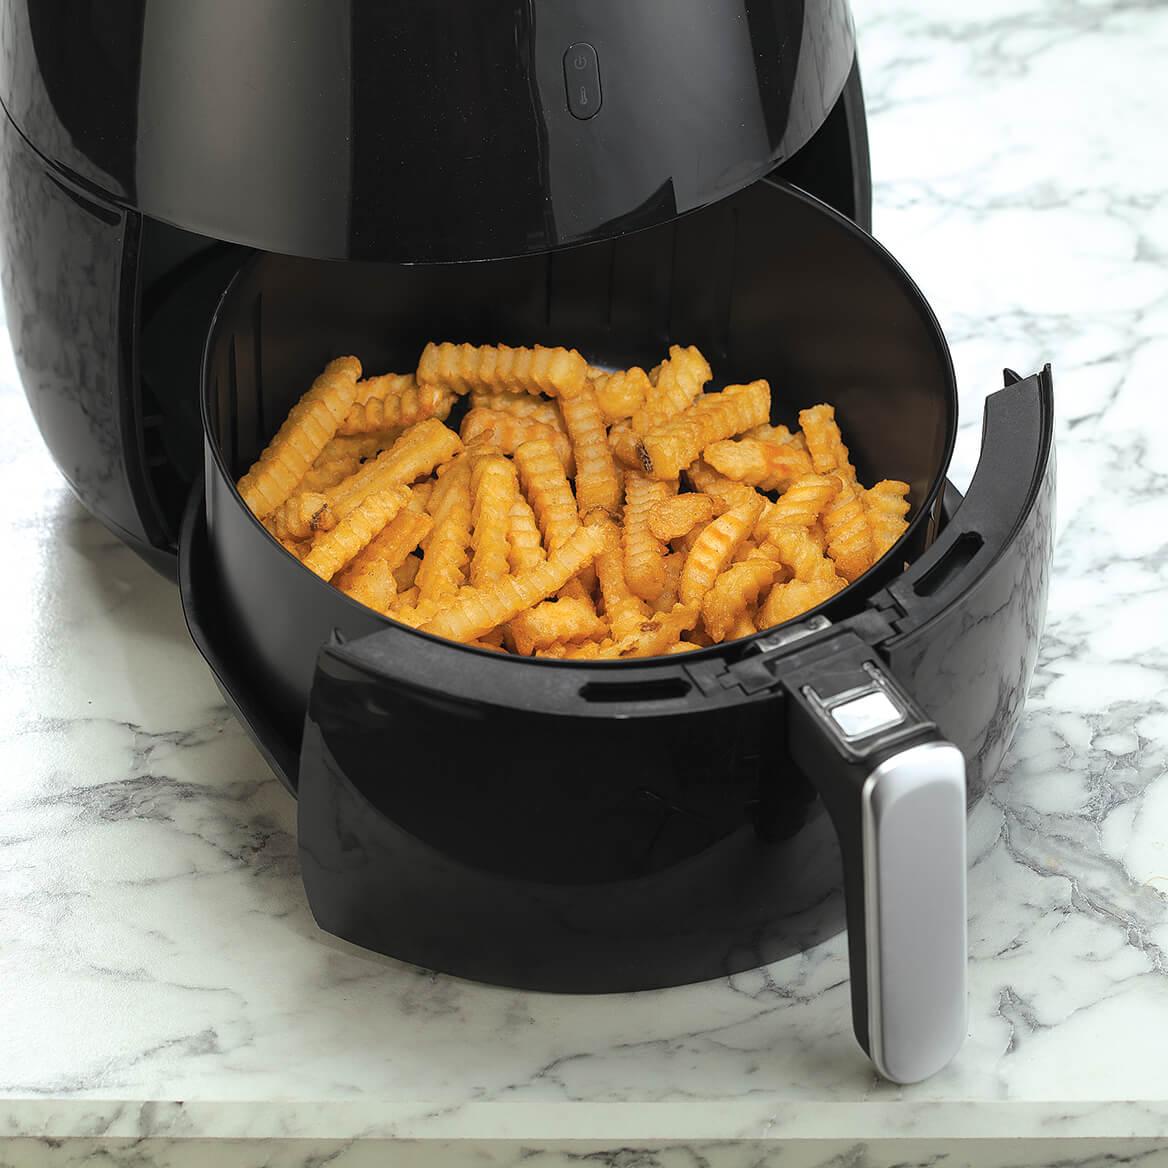 Home Marketplace Air Fryer, 5.5 Qt.       XL-362485